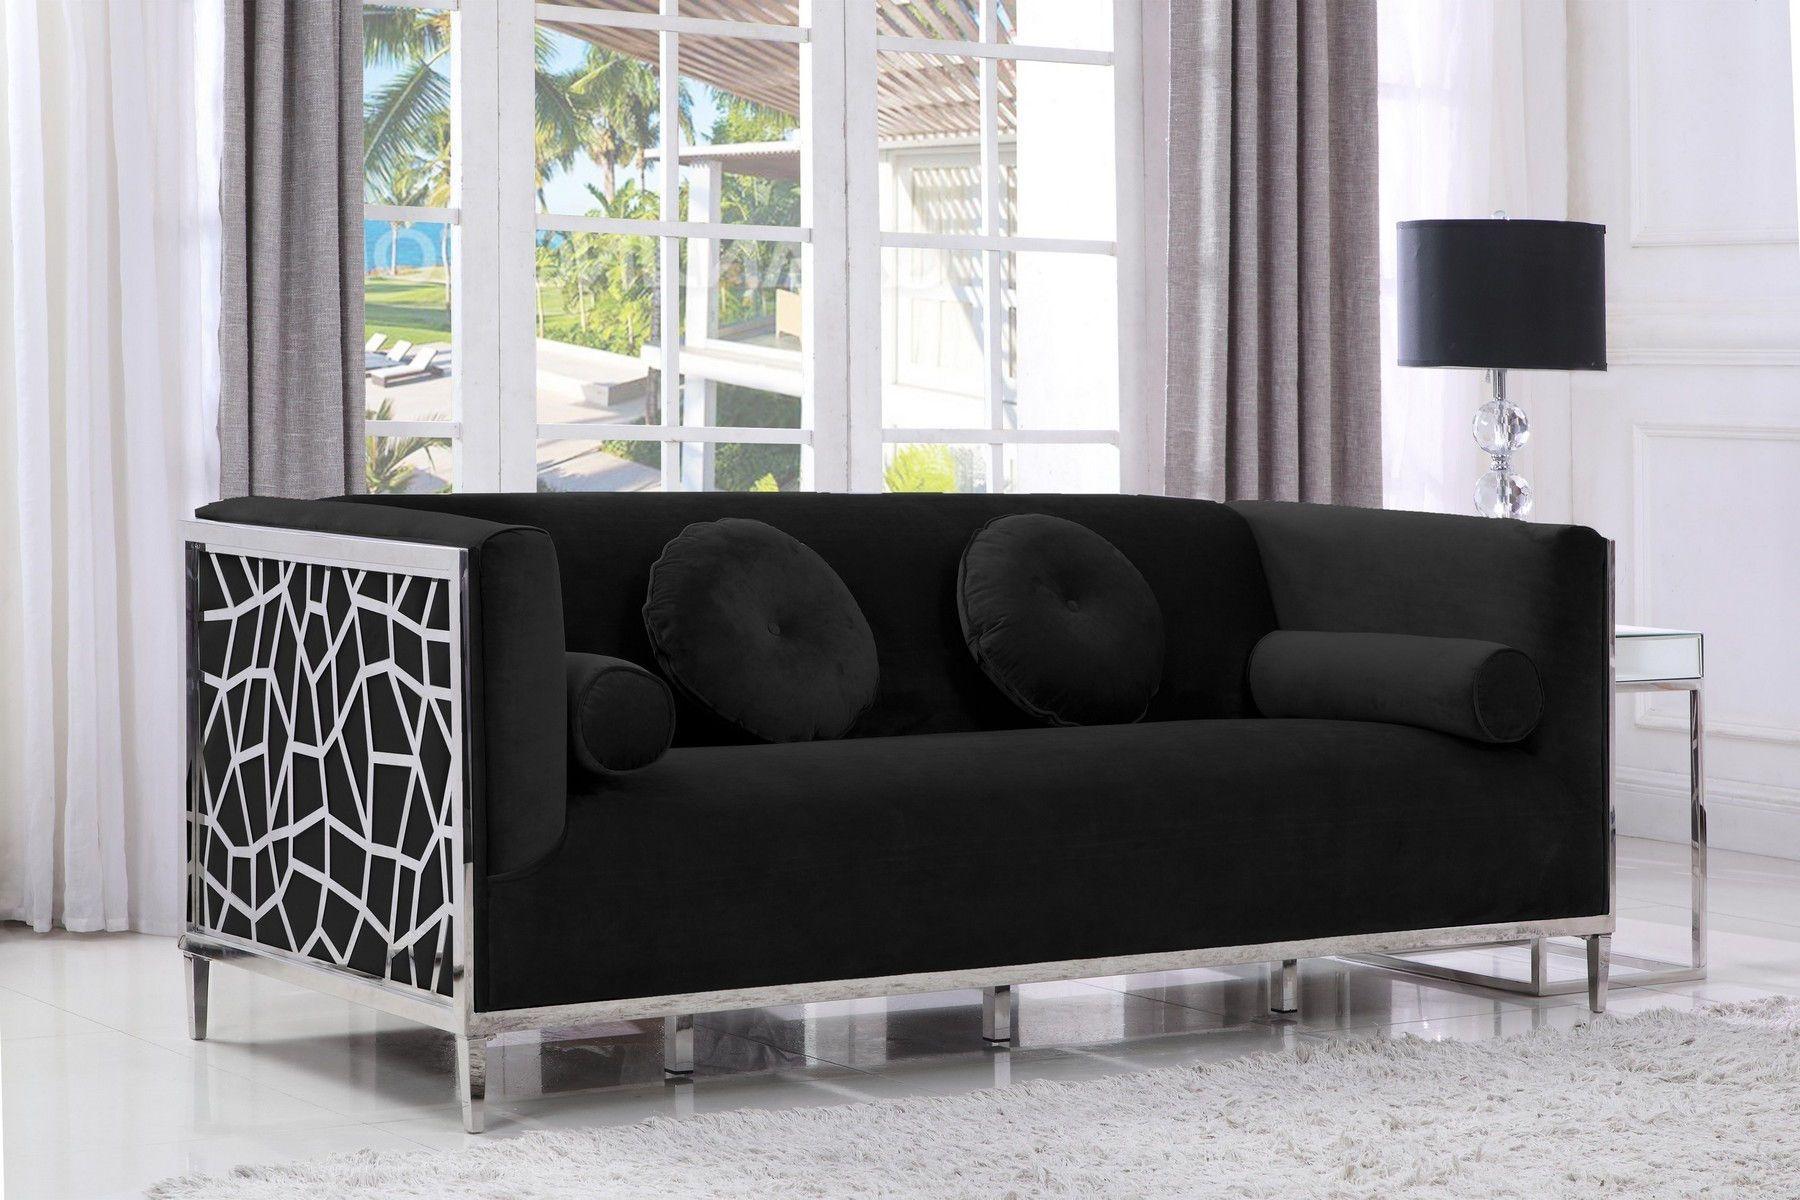 Opal Black Sofa 672 Meridian Furniture Fabric Sofas In 2021 Furniture Design Living Room Living Room Sofa Design Meridian Furniture